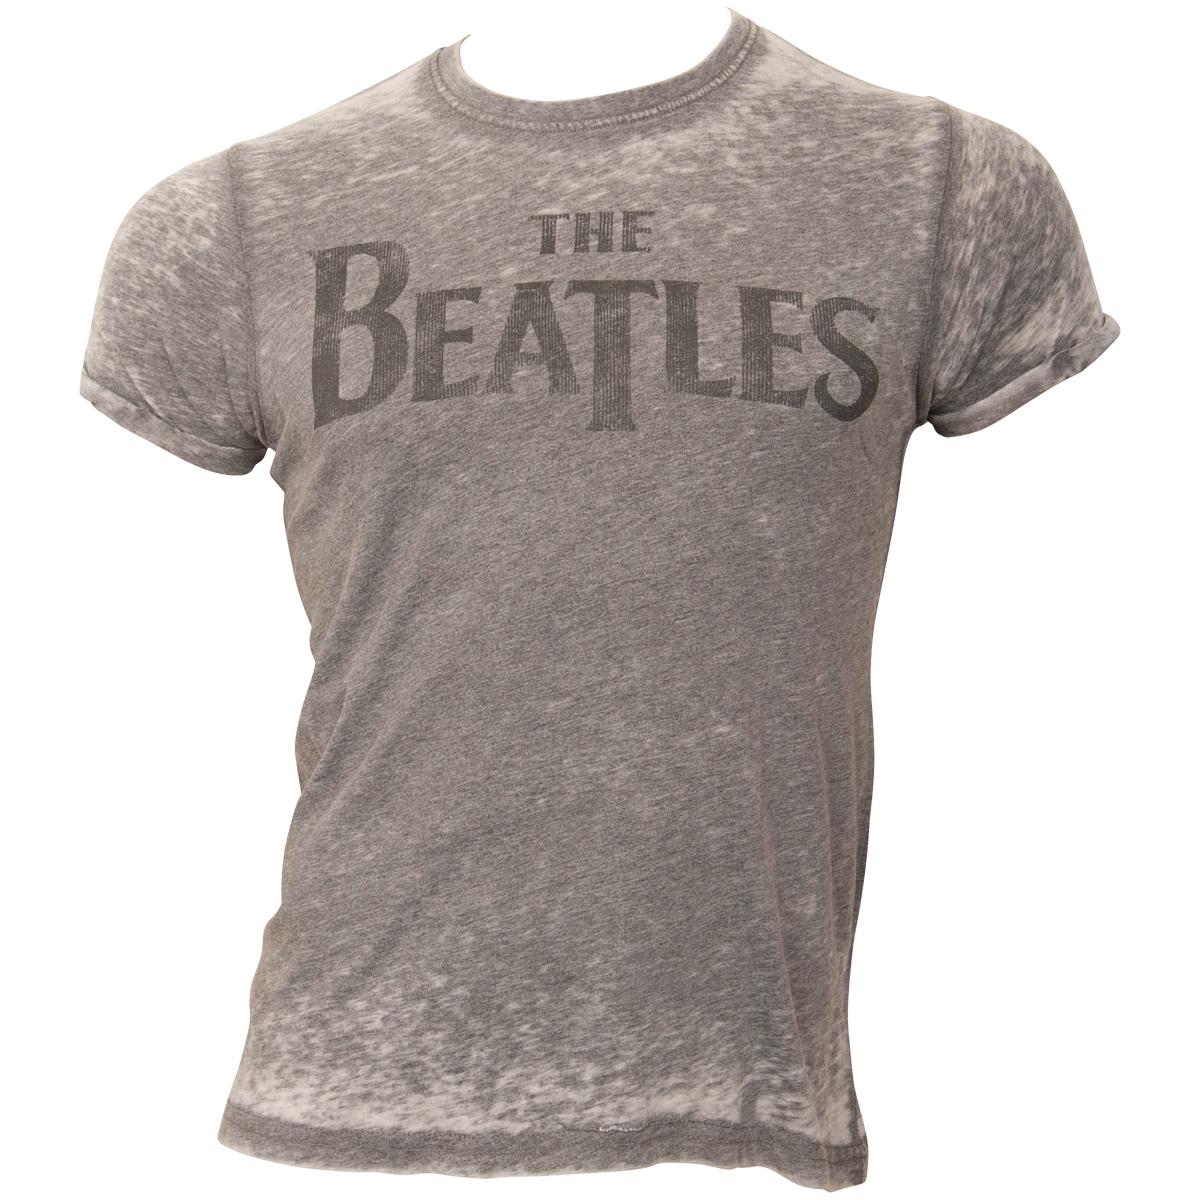 The Beatles - T-Shirt Drop T Logo - grau